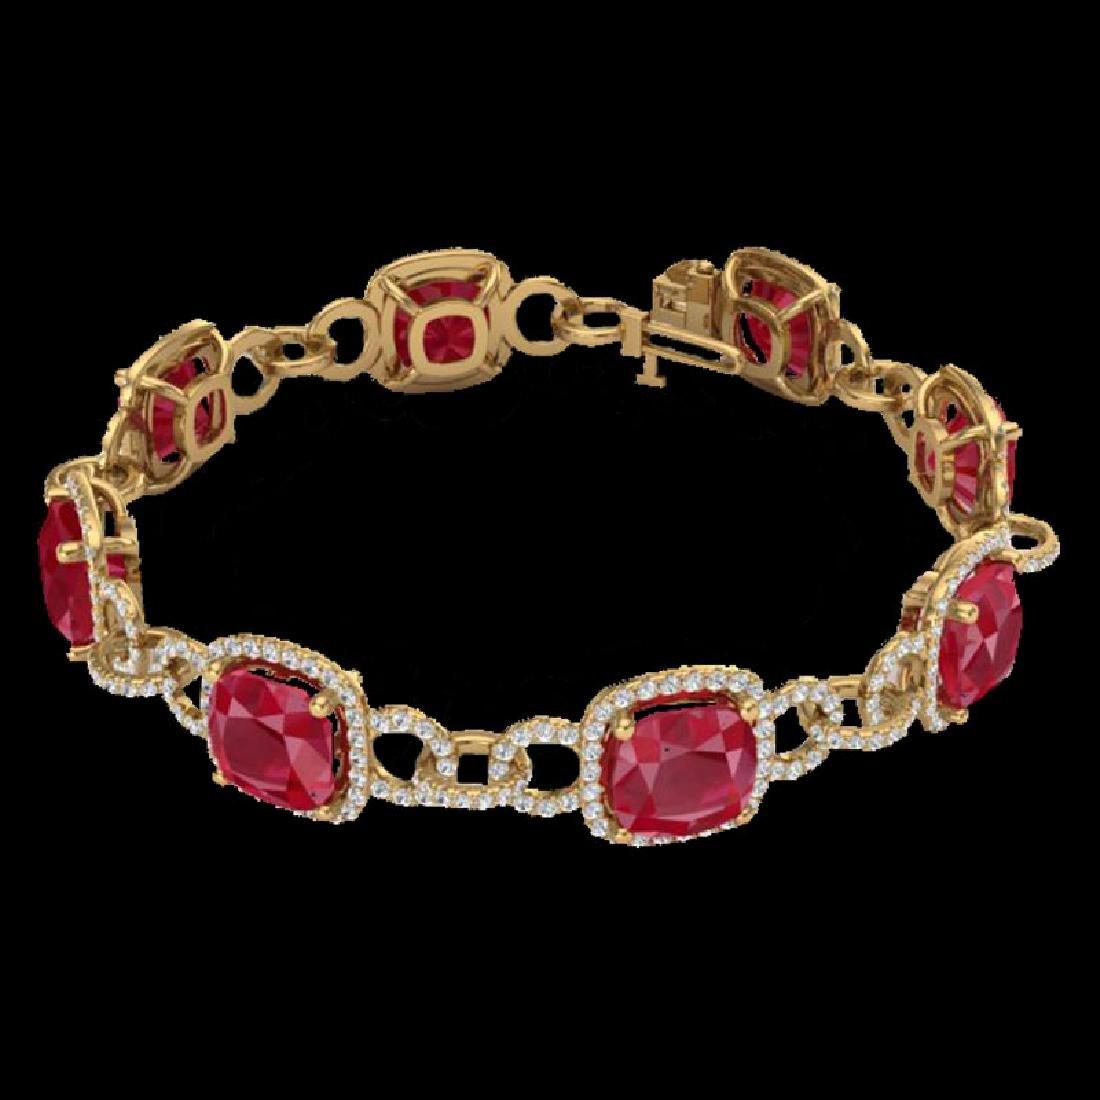 25 CTW Ruby & Micro VS/SI Diamond Bracelet 14K Yellow